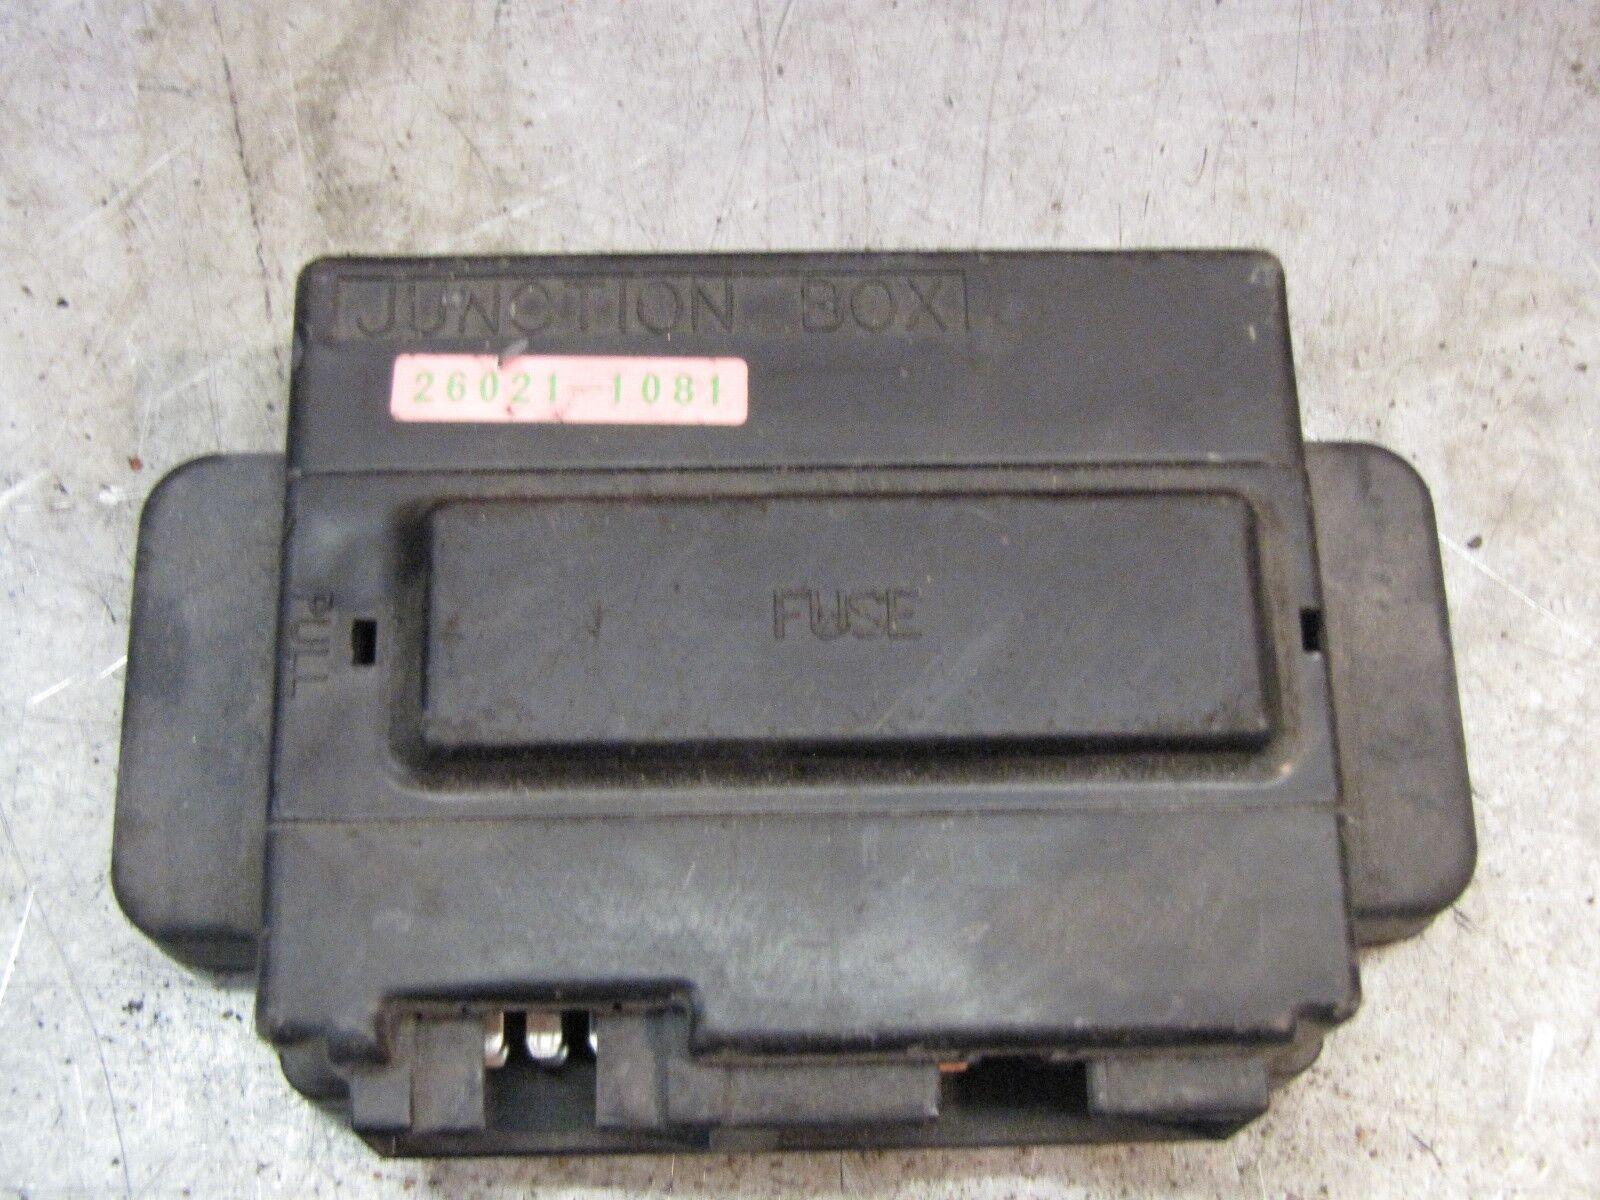 KAWASAKI ZZR600 ZZR600-E ZEKERINGSDOOS FUSE BOX 26021-1070 26021-1081